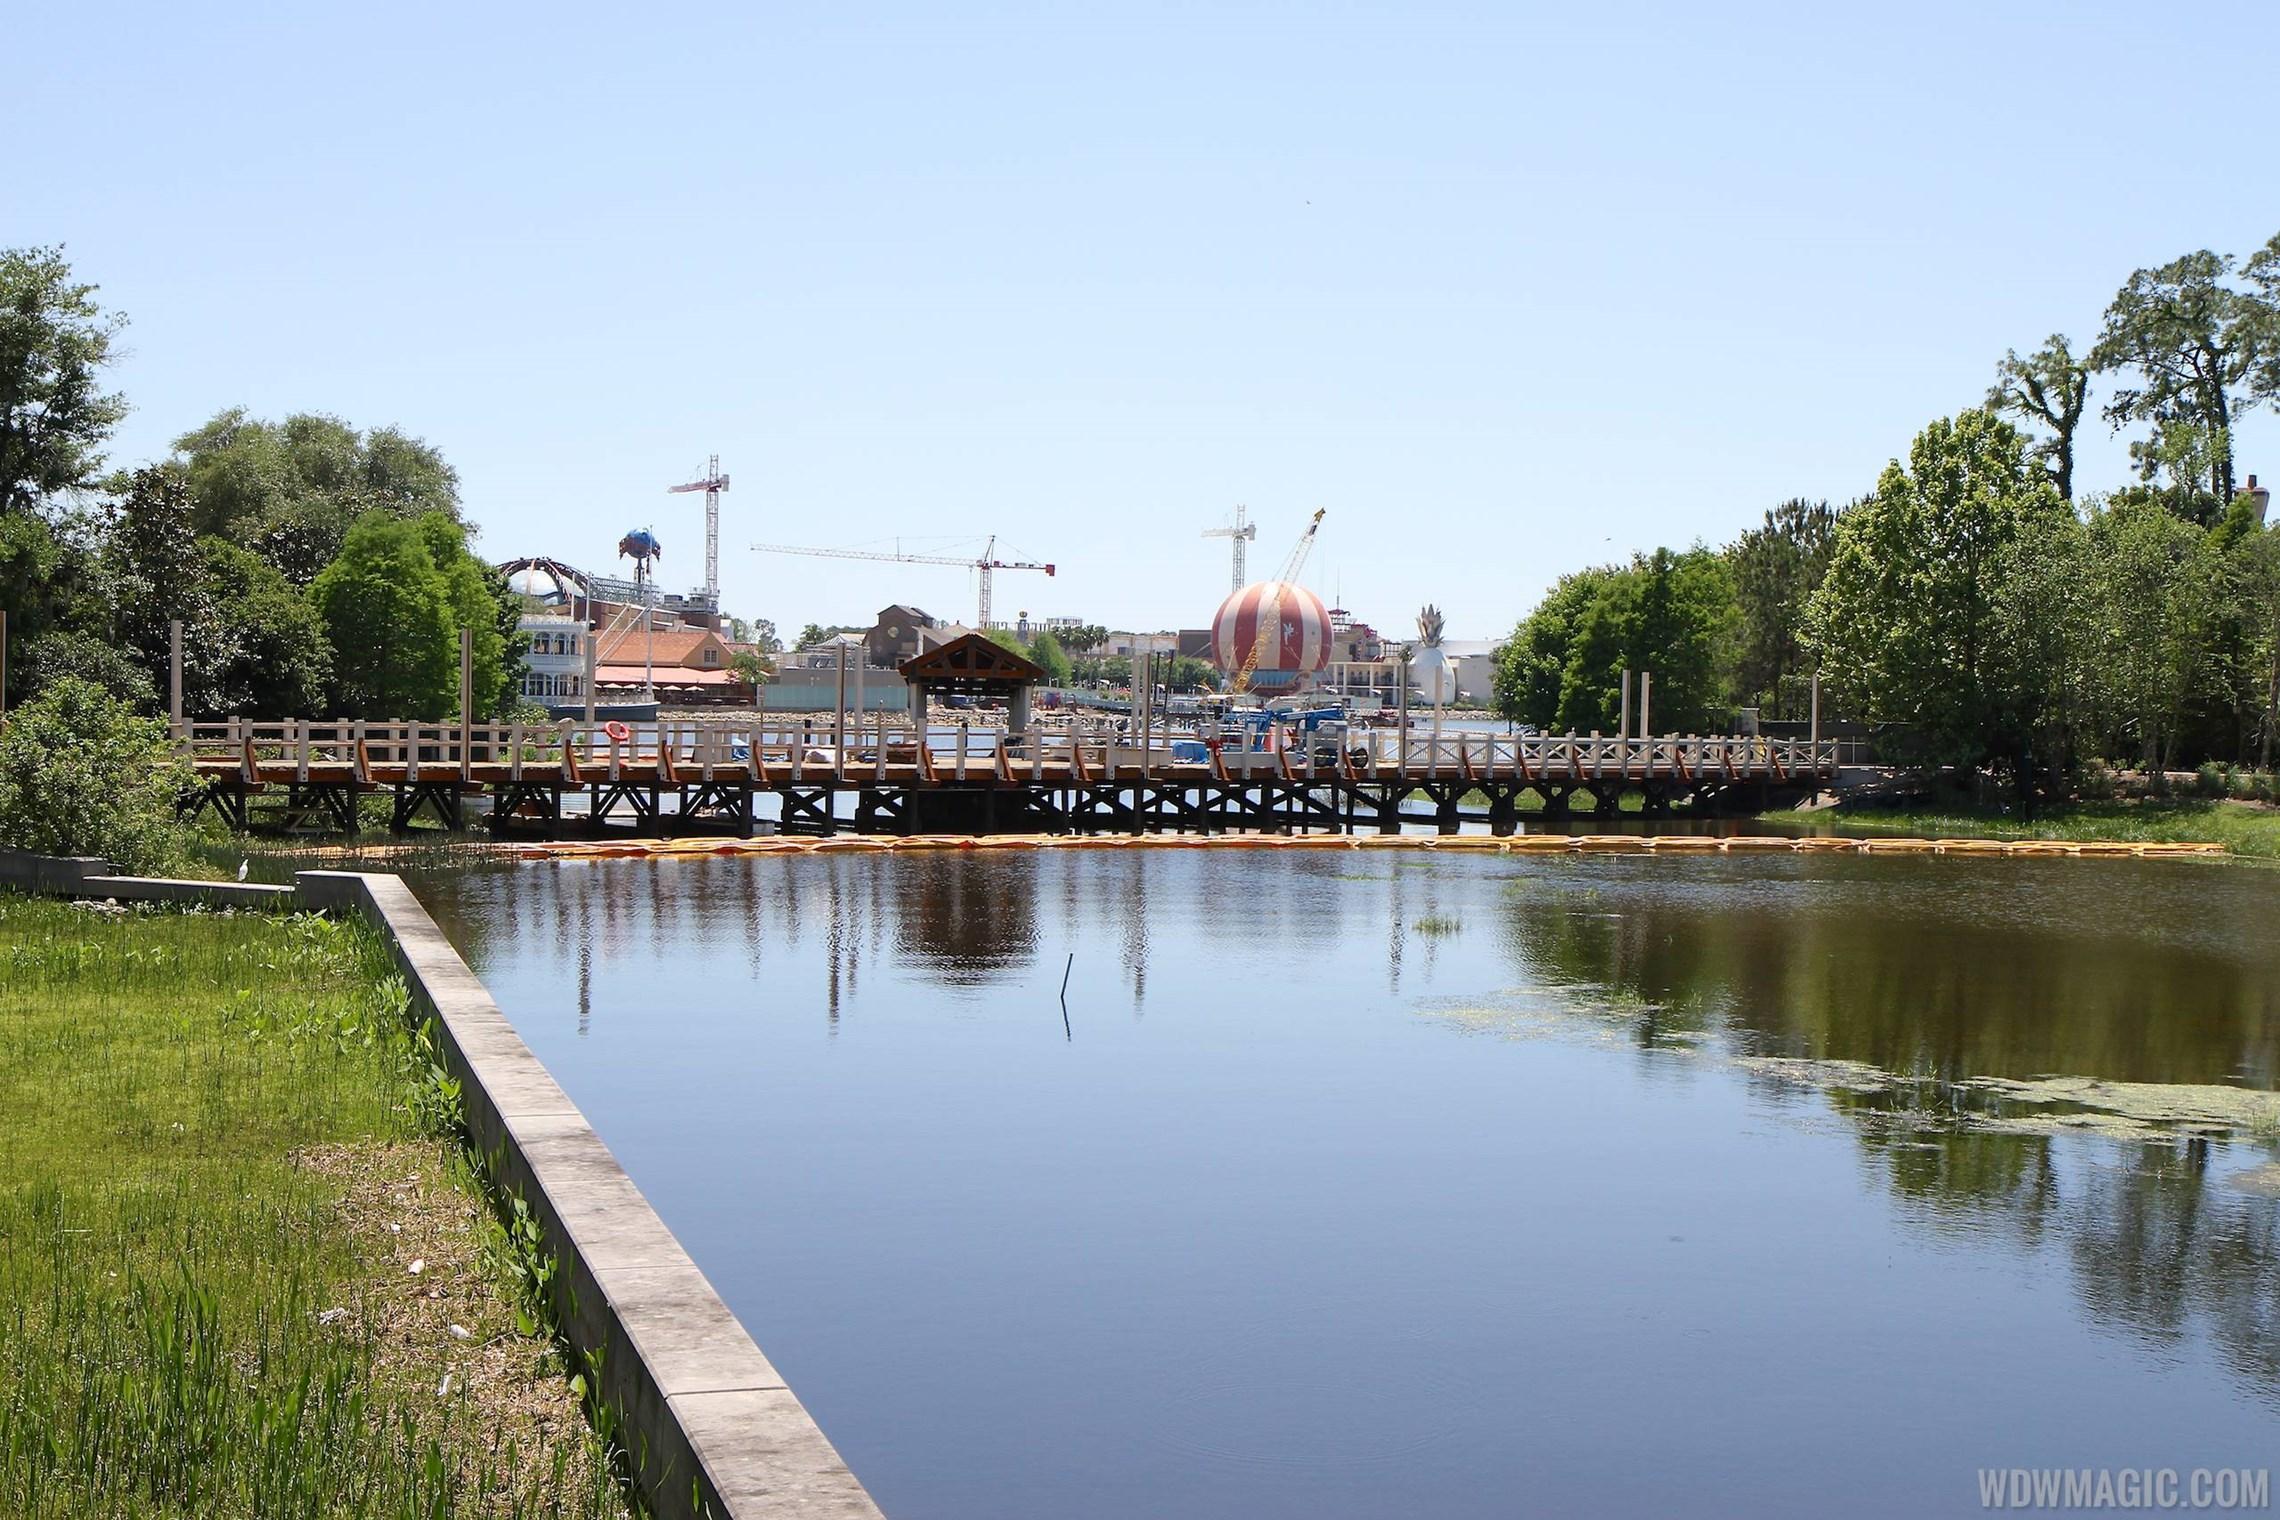 Marketplace to Saratoga Springs Resort bridge and boat dock construction